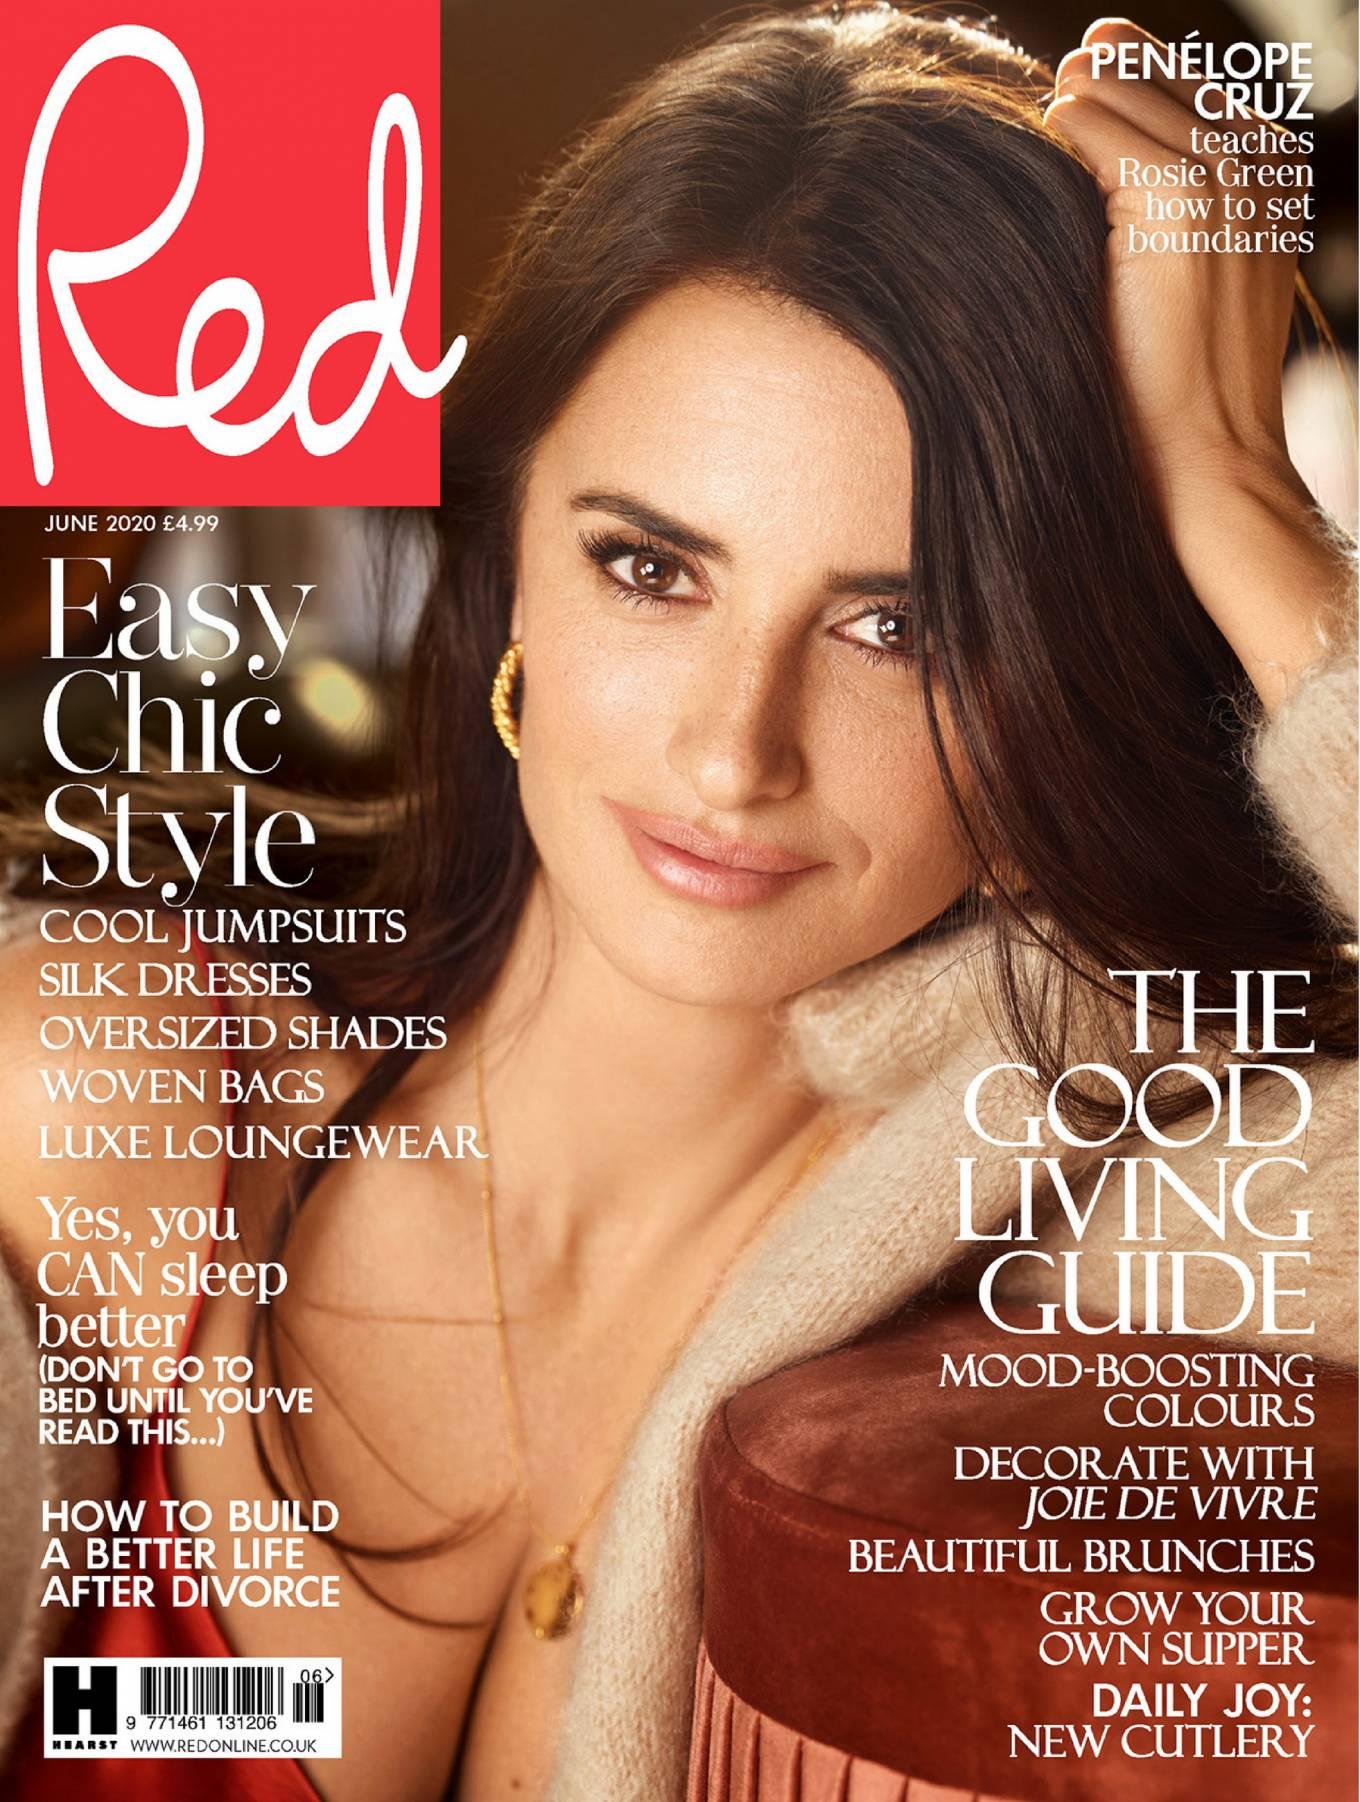 Penelope Cruz 2020 : Penelope Cruz – Red UK Magazine 2020-07